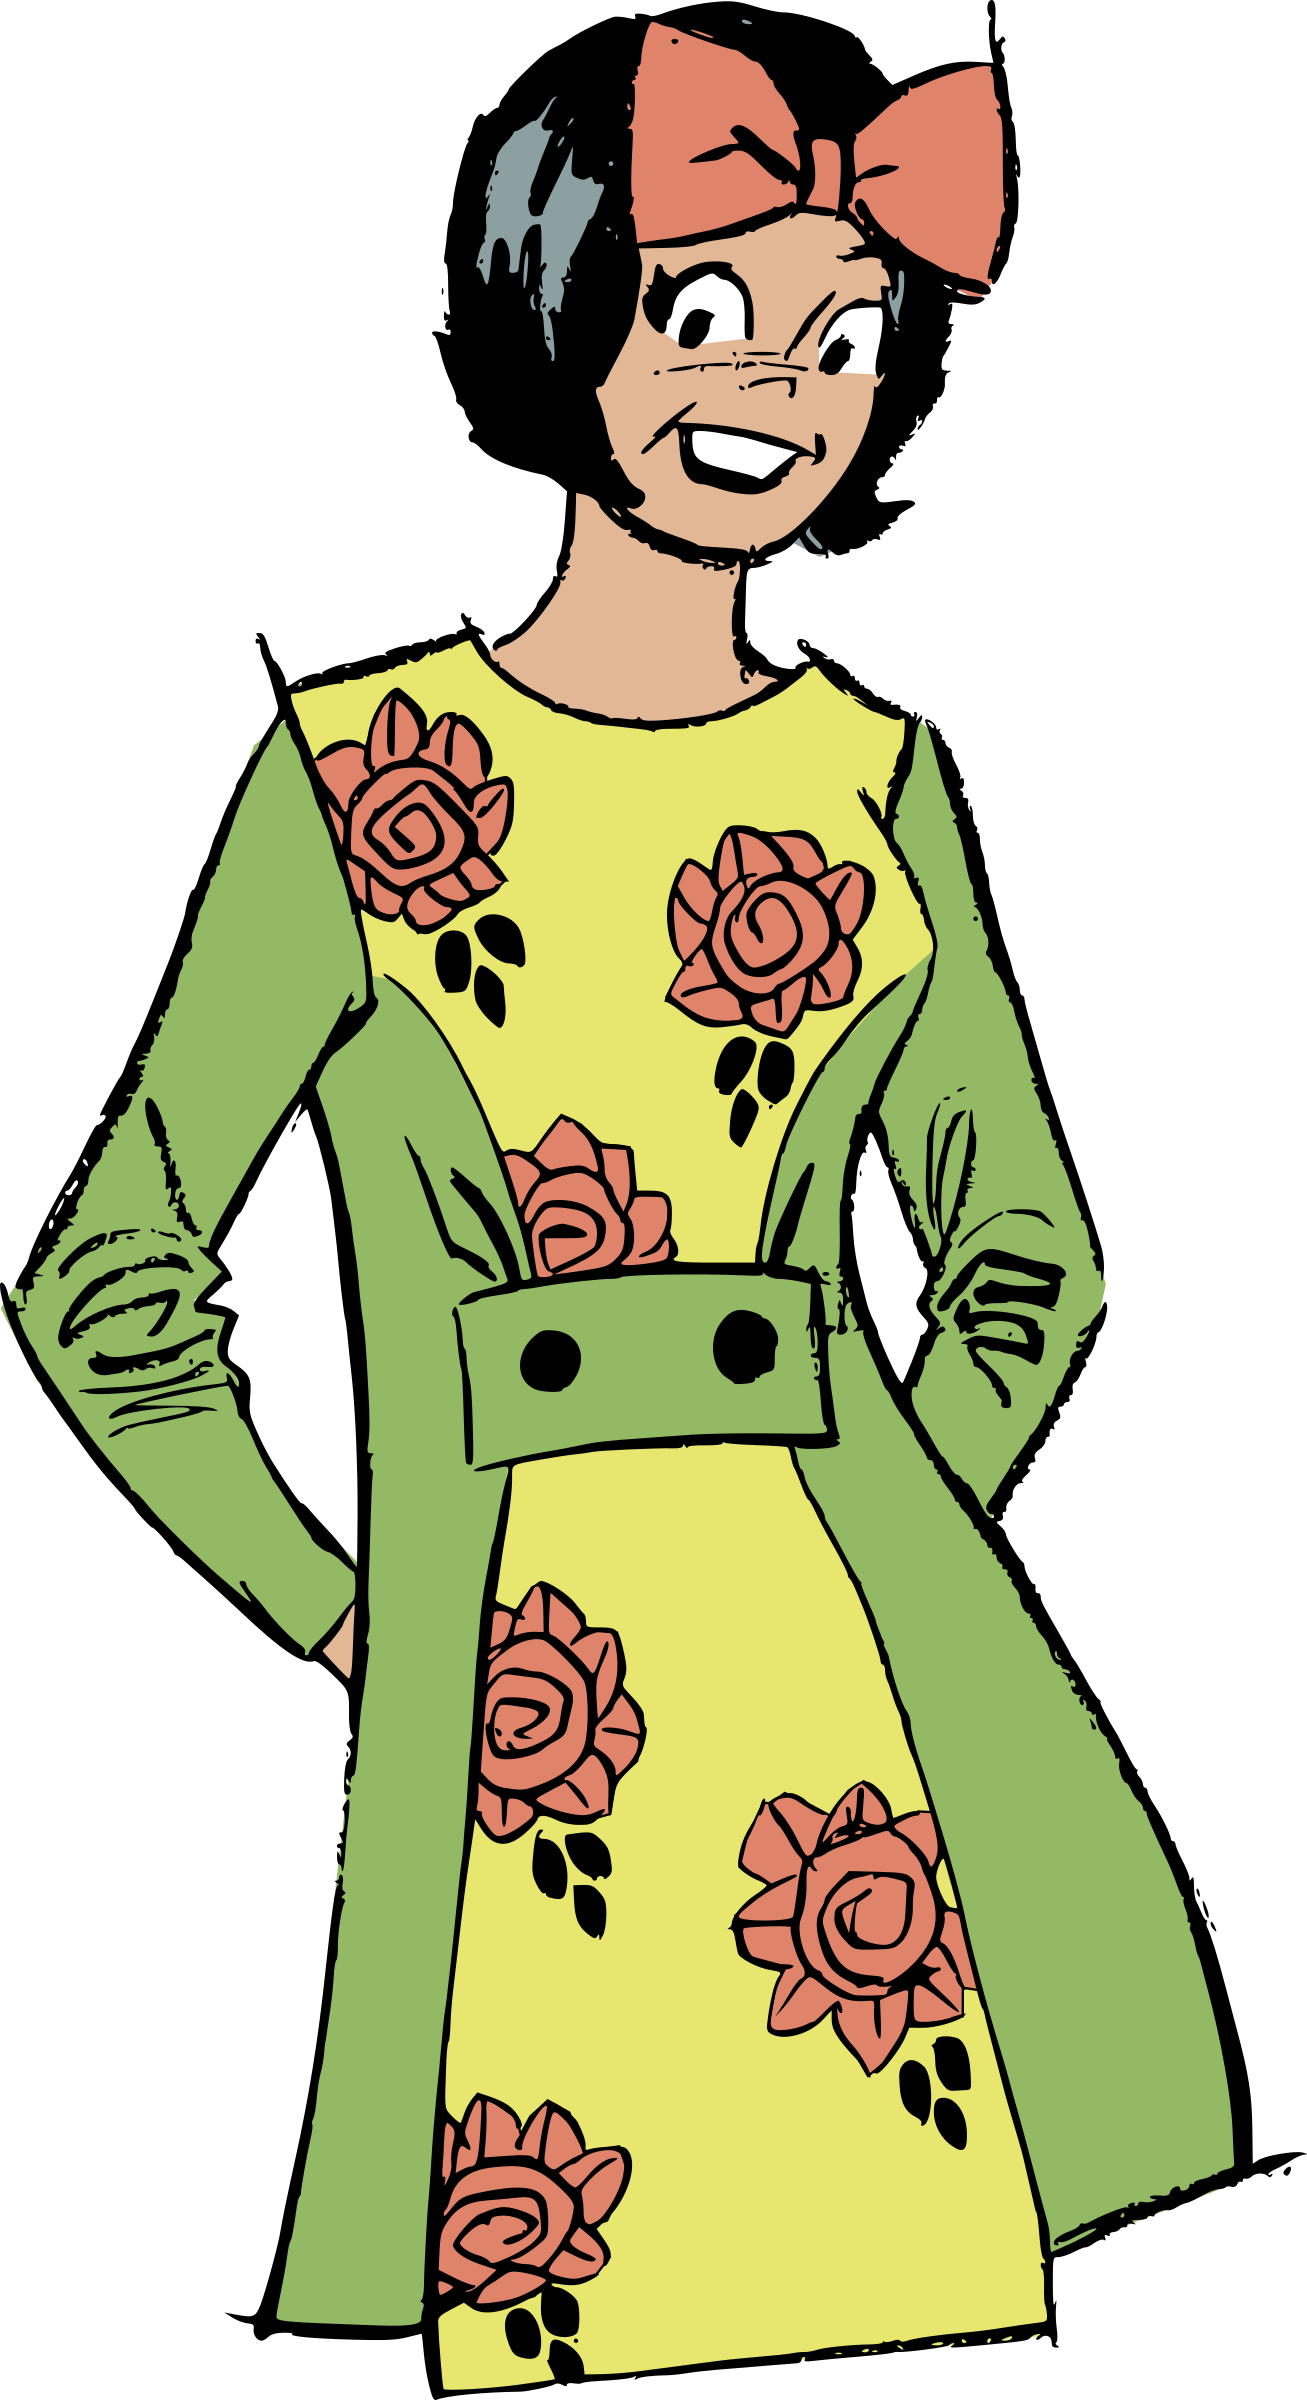 Flower dress big image. Costume clipart clothing